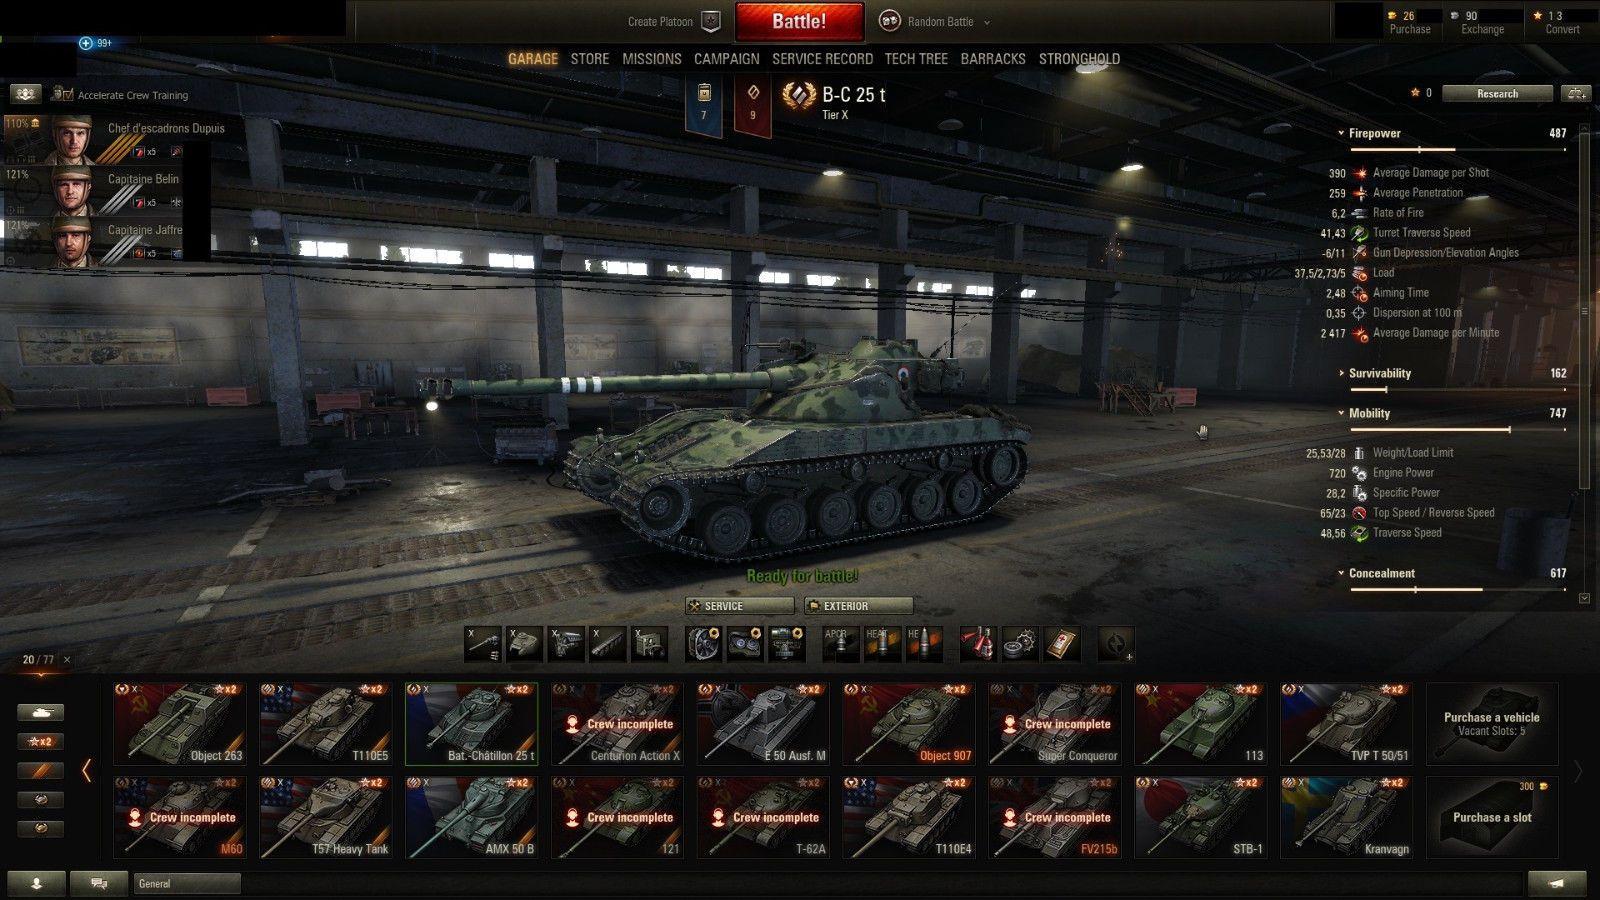 World Of Tanks Account Eu 3100 Wn8 35000 Battles 19 Tier X 90 Million Credits World Of Tanks World Battle